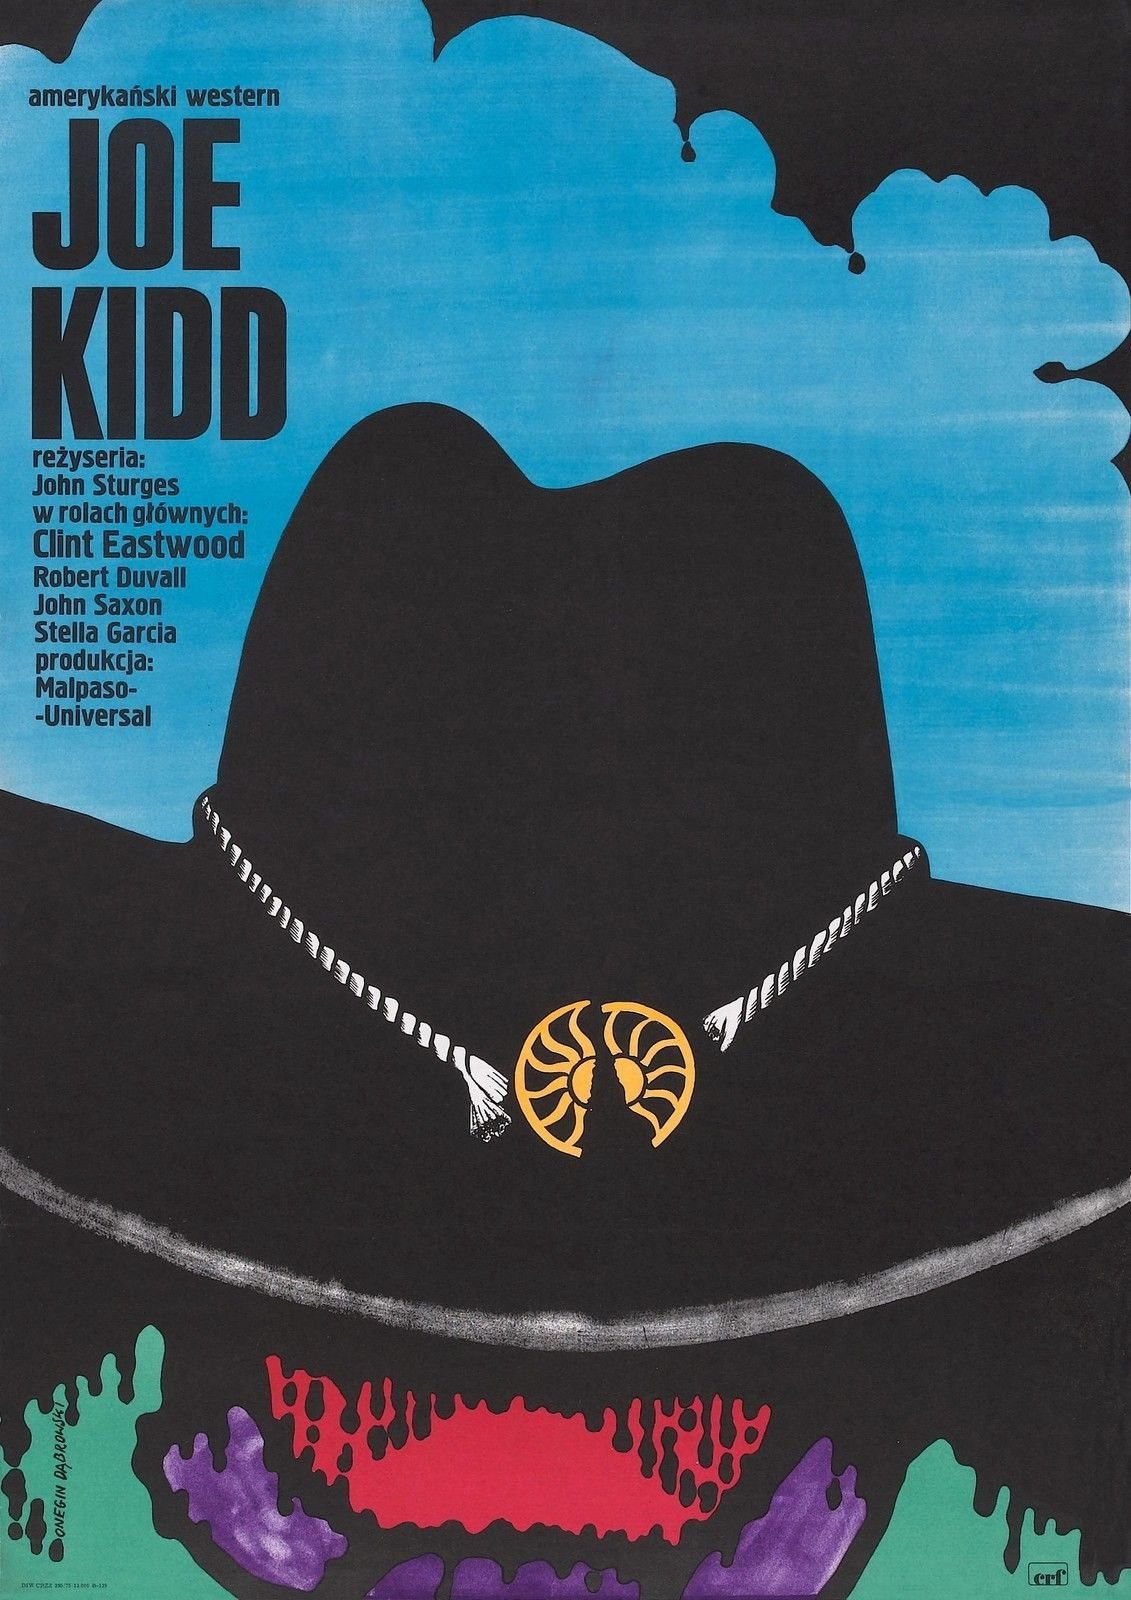 74300-JOE-KIDD-Movie-RARE-Clint-Eastwood-Western-FRAMED-CANVAS-PRINT-Toile